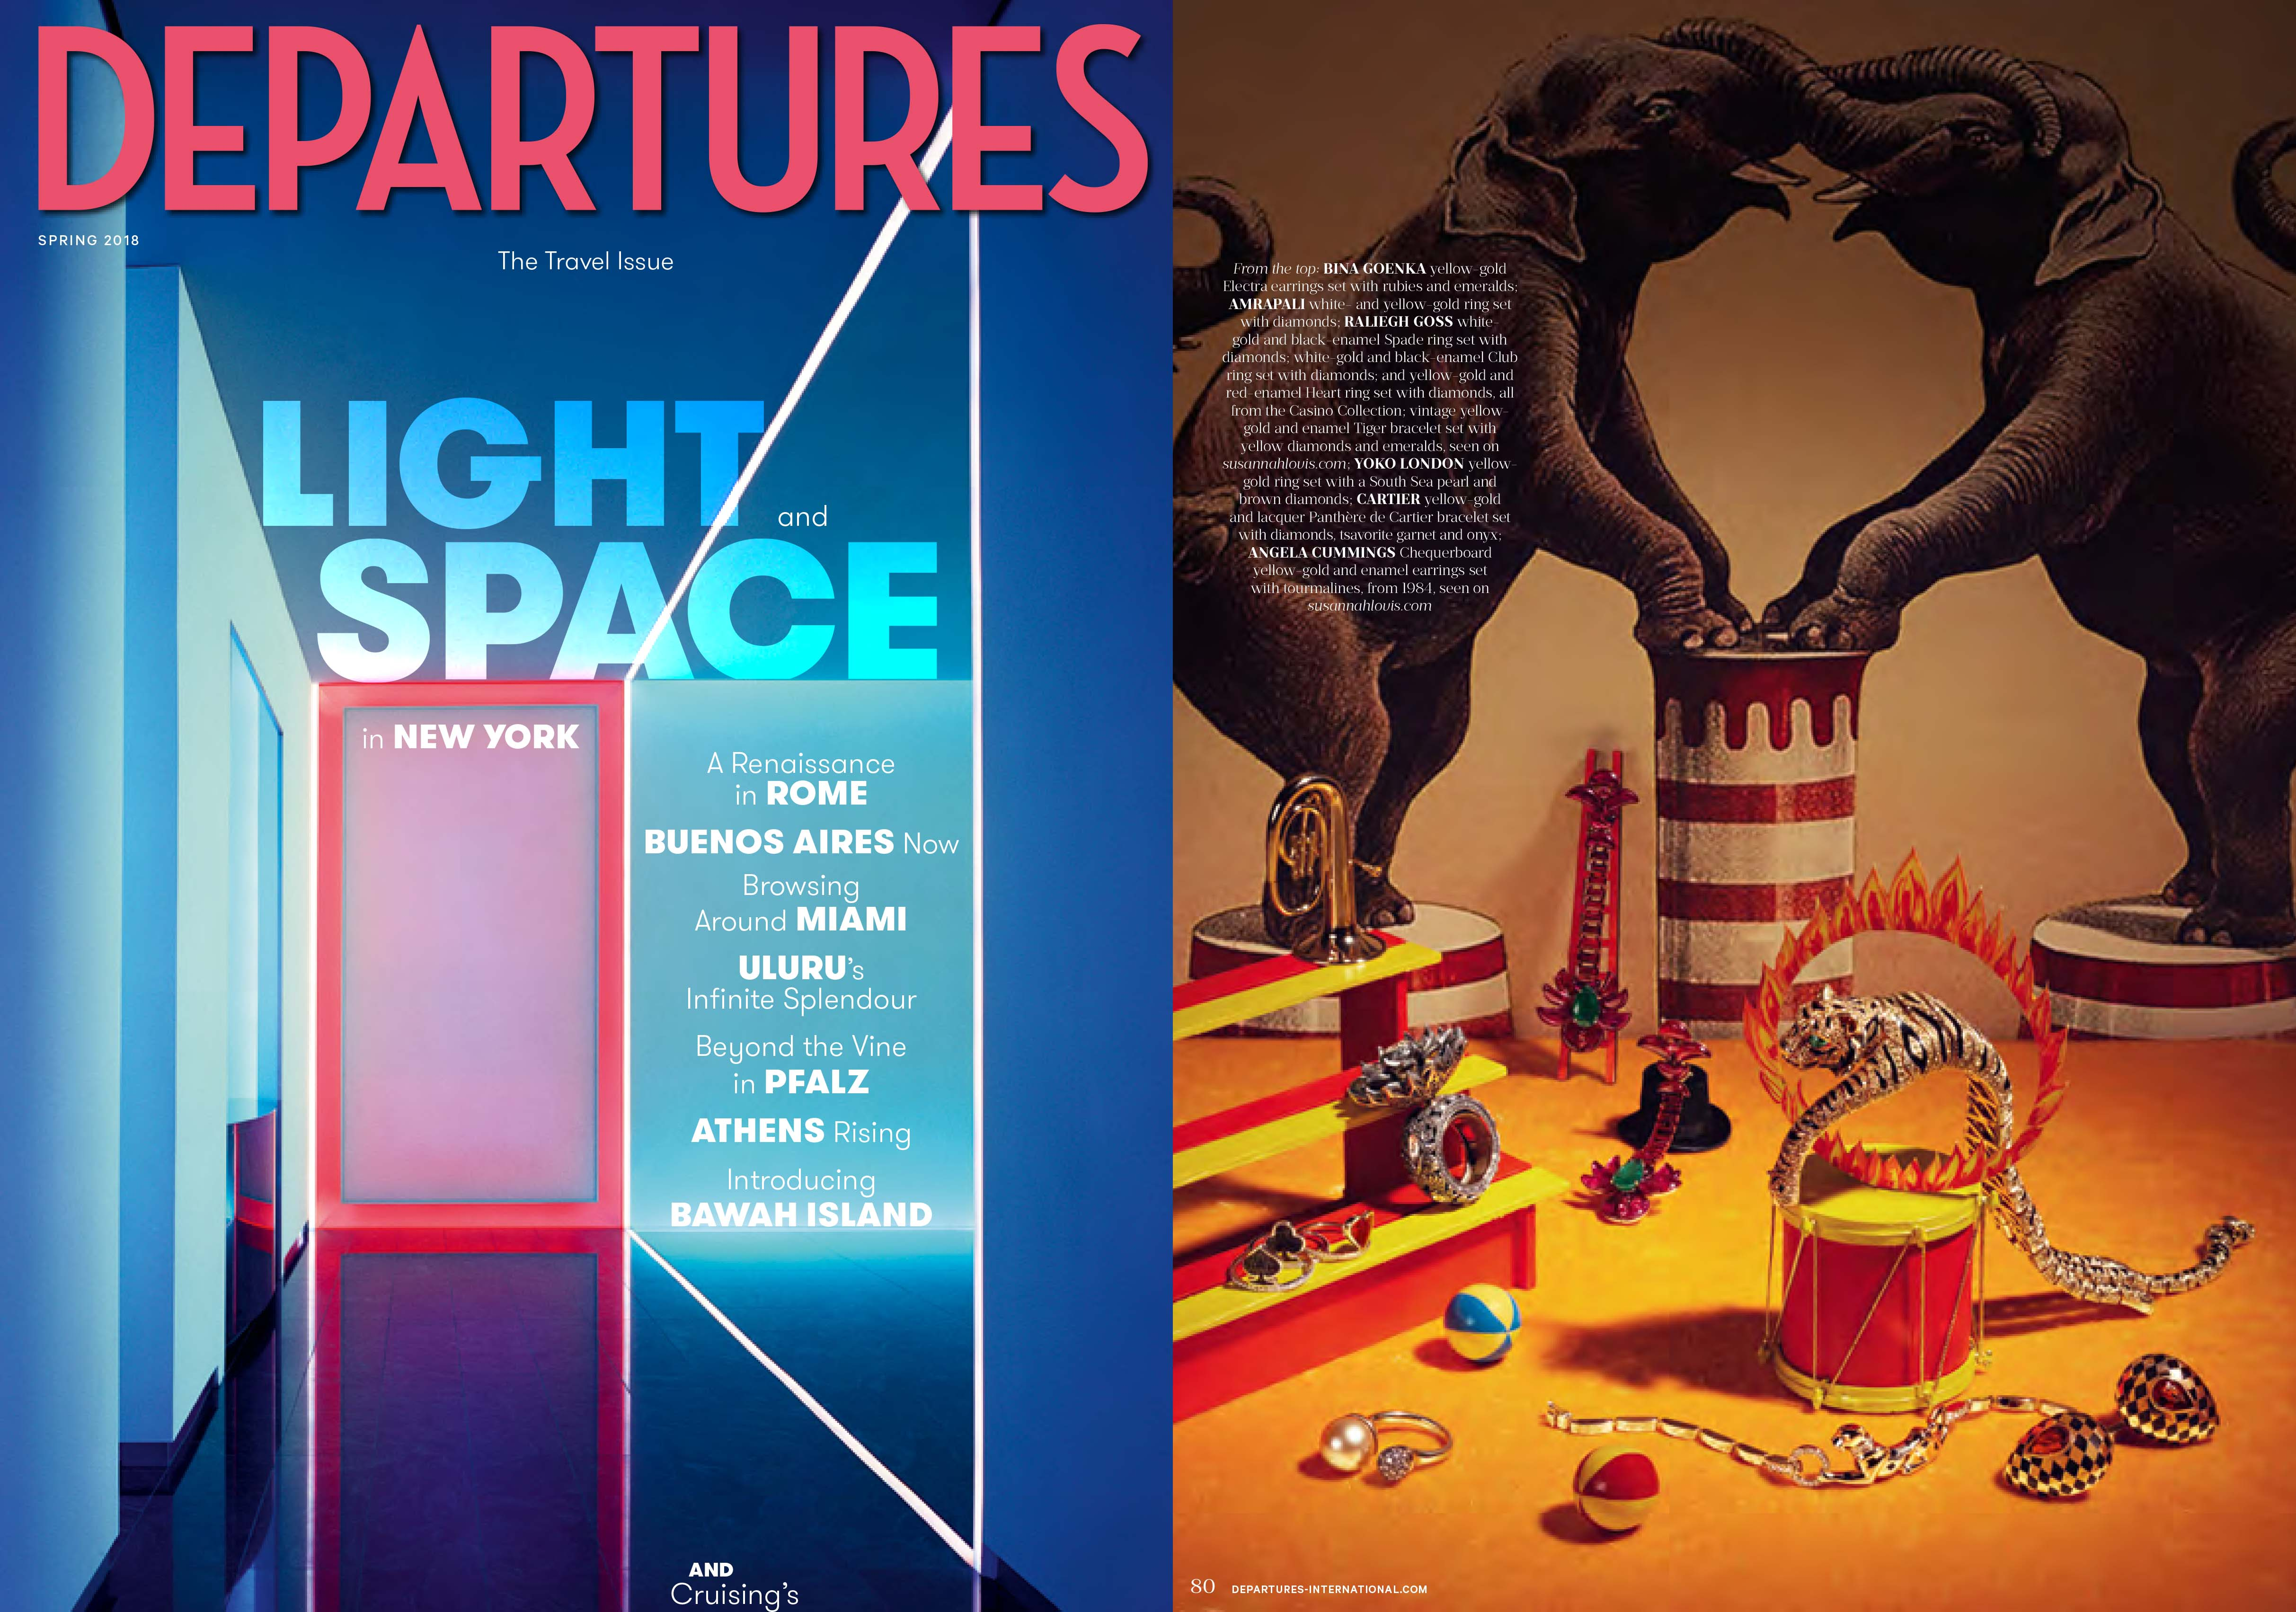 Centurion Departures Magazine